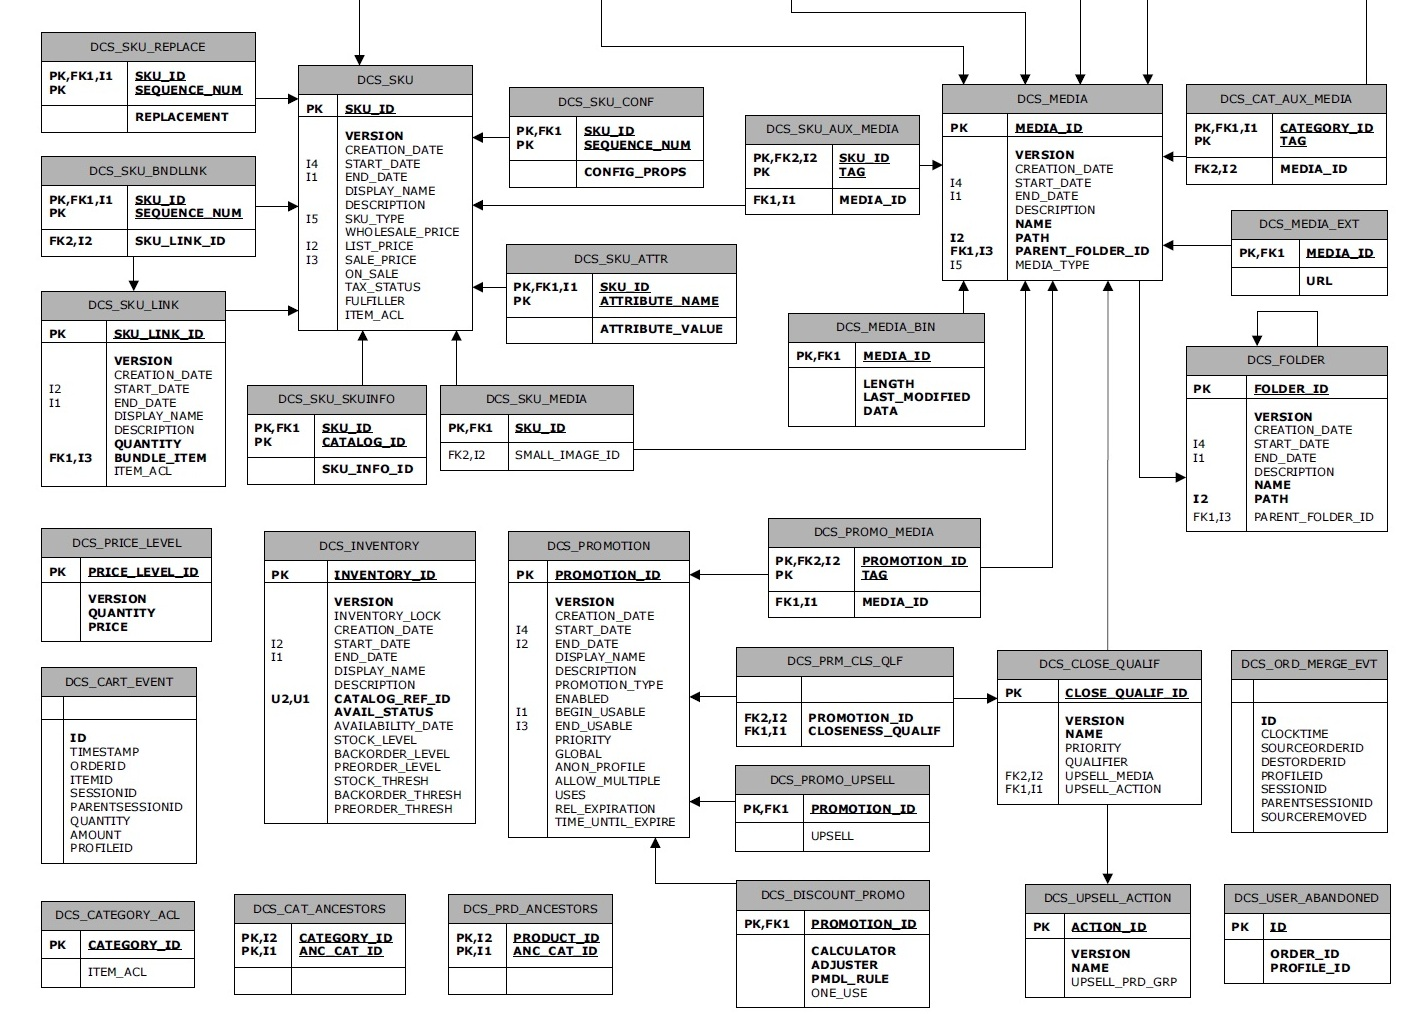 atg product catalog schema er diagram [ 1420 x 1014 Pixel ]